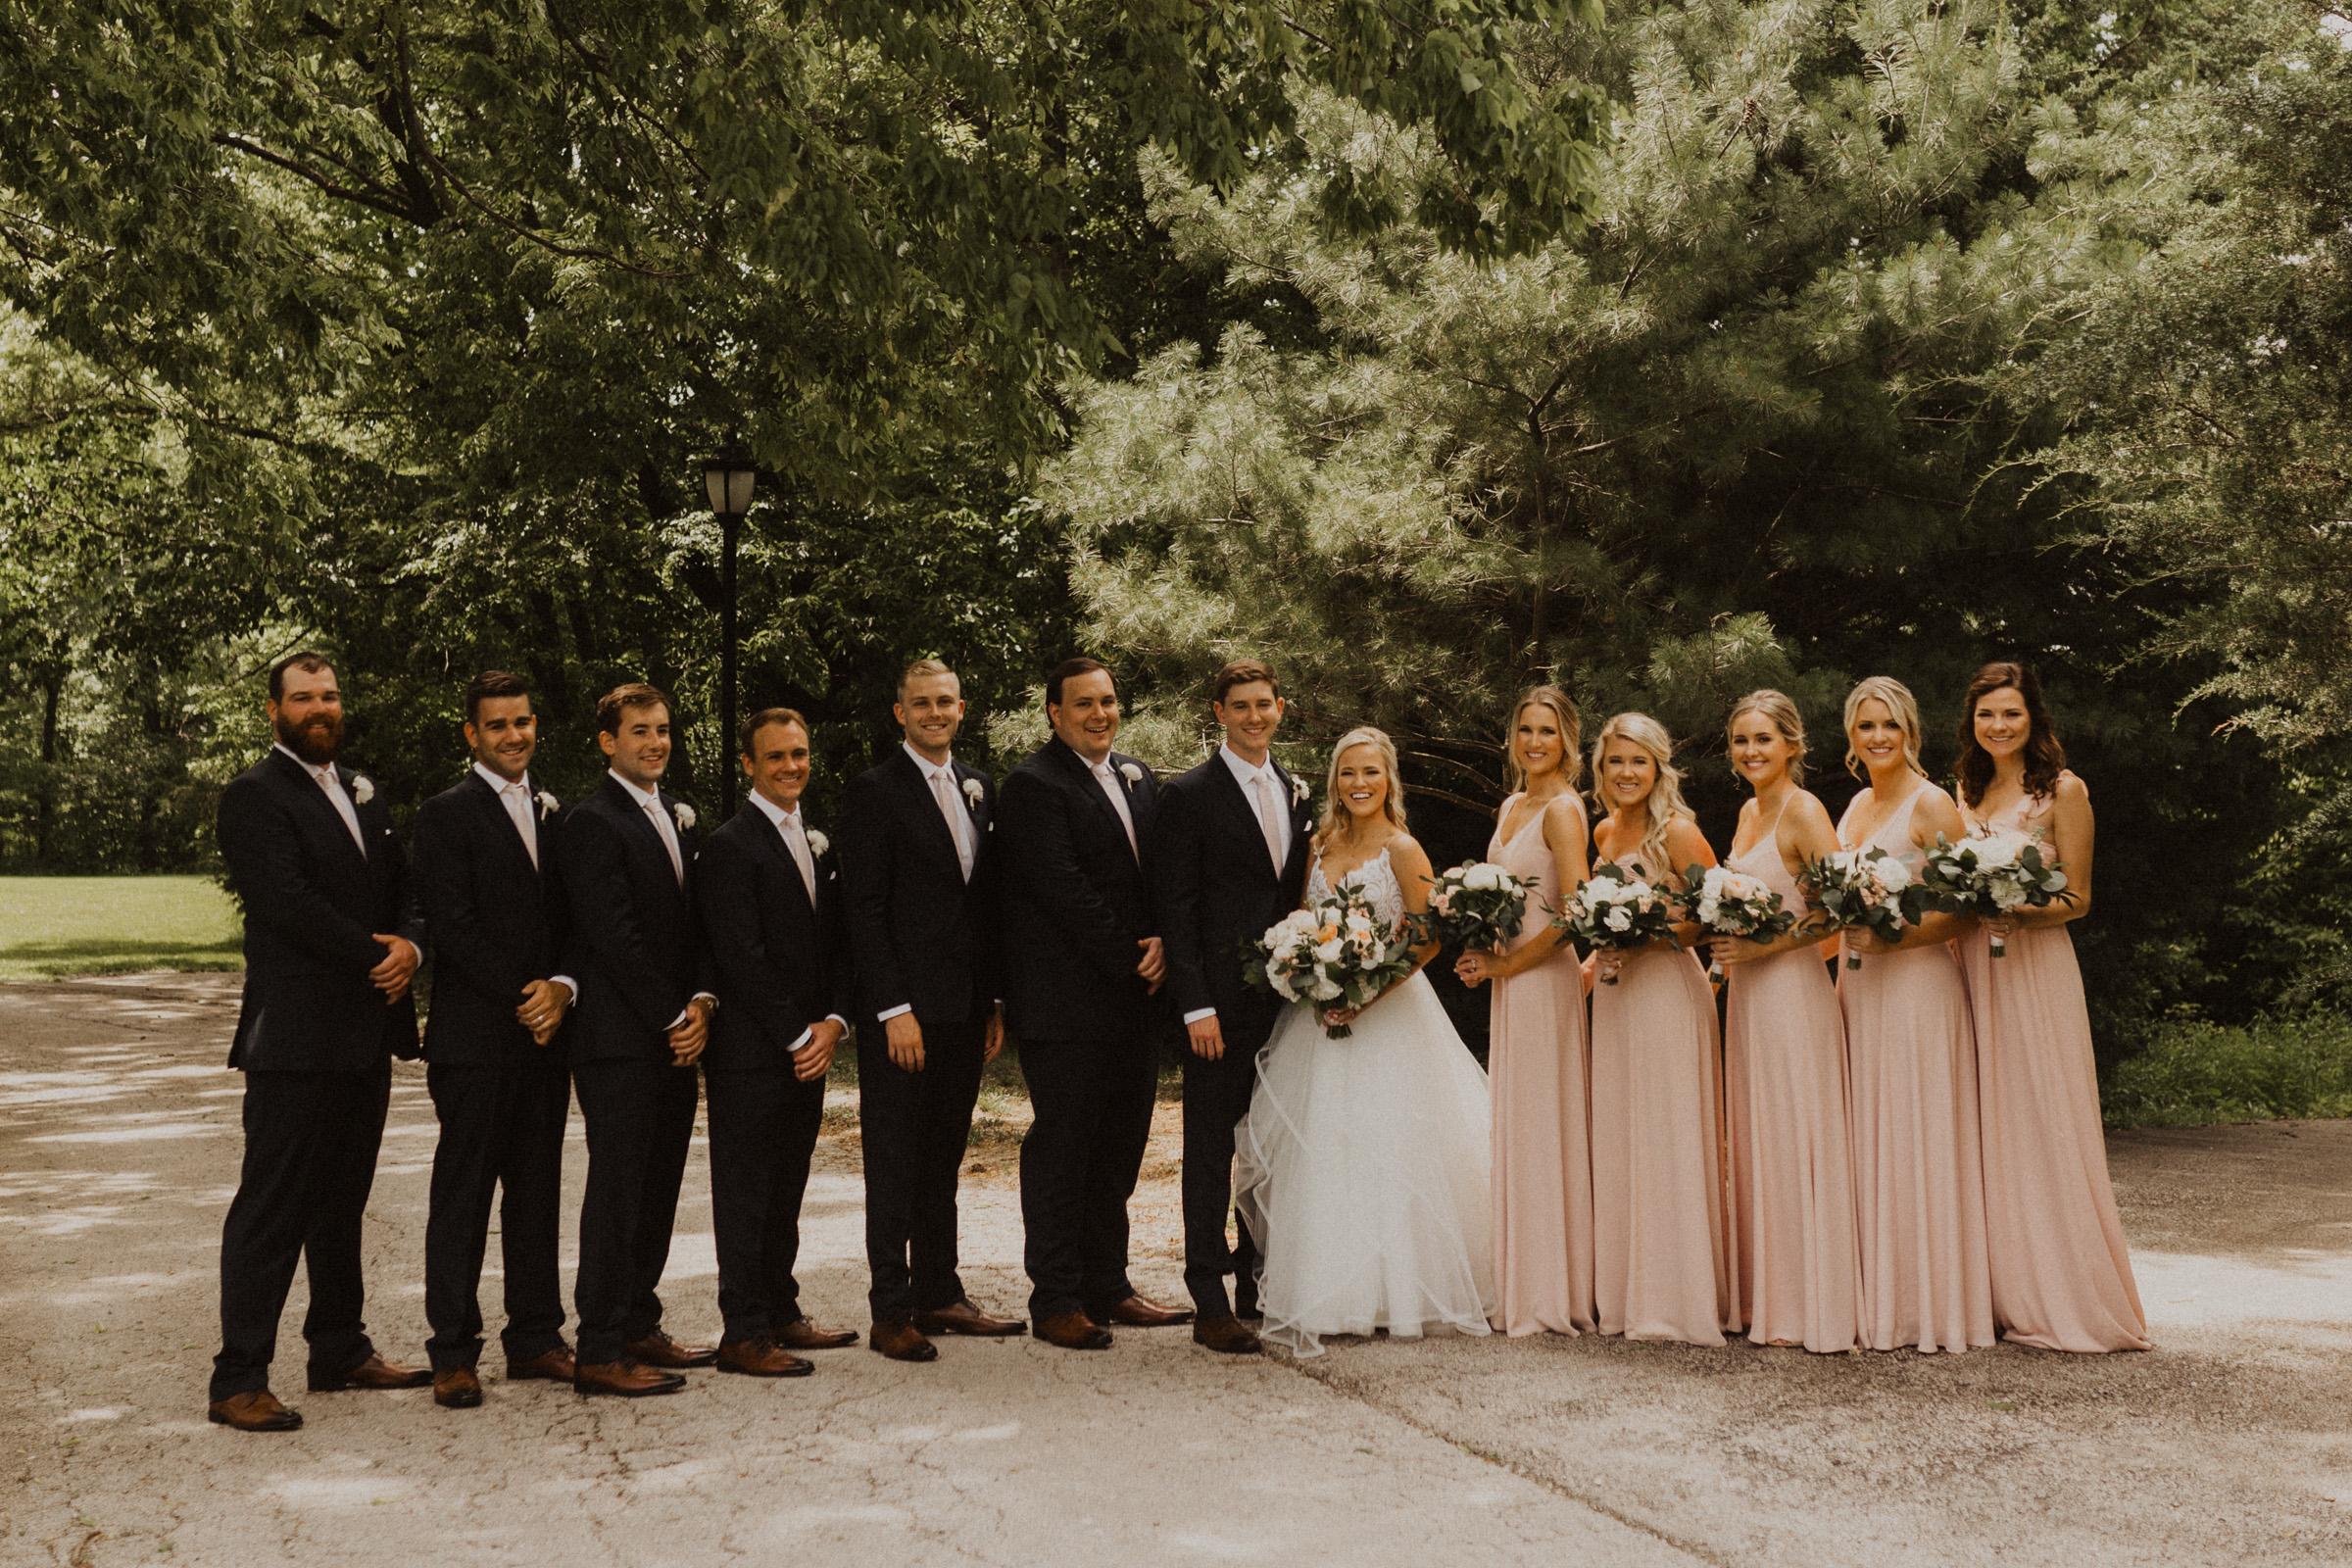 alyssa barletter photography hawthorne house summer outdoor wedding southern charm inspiration-21.jpg